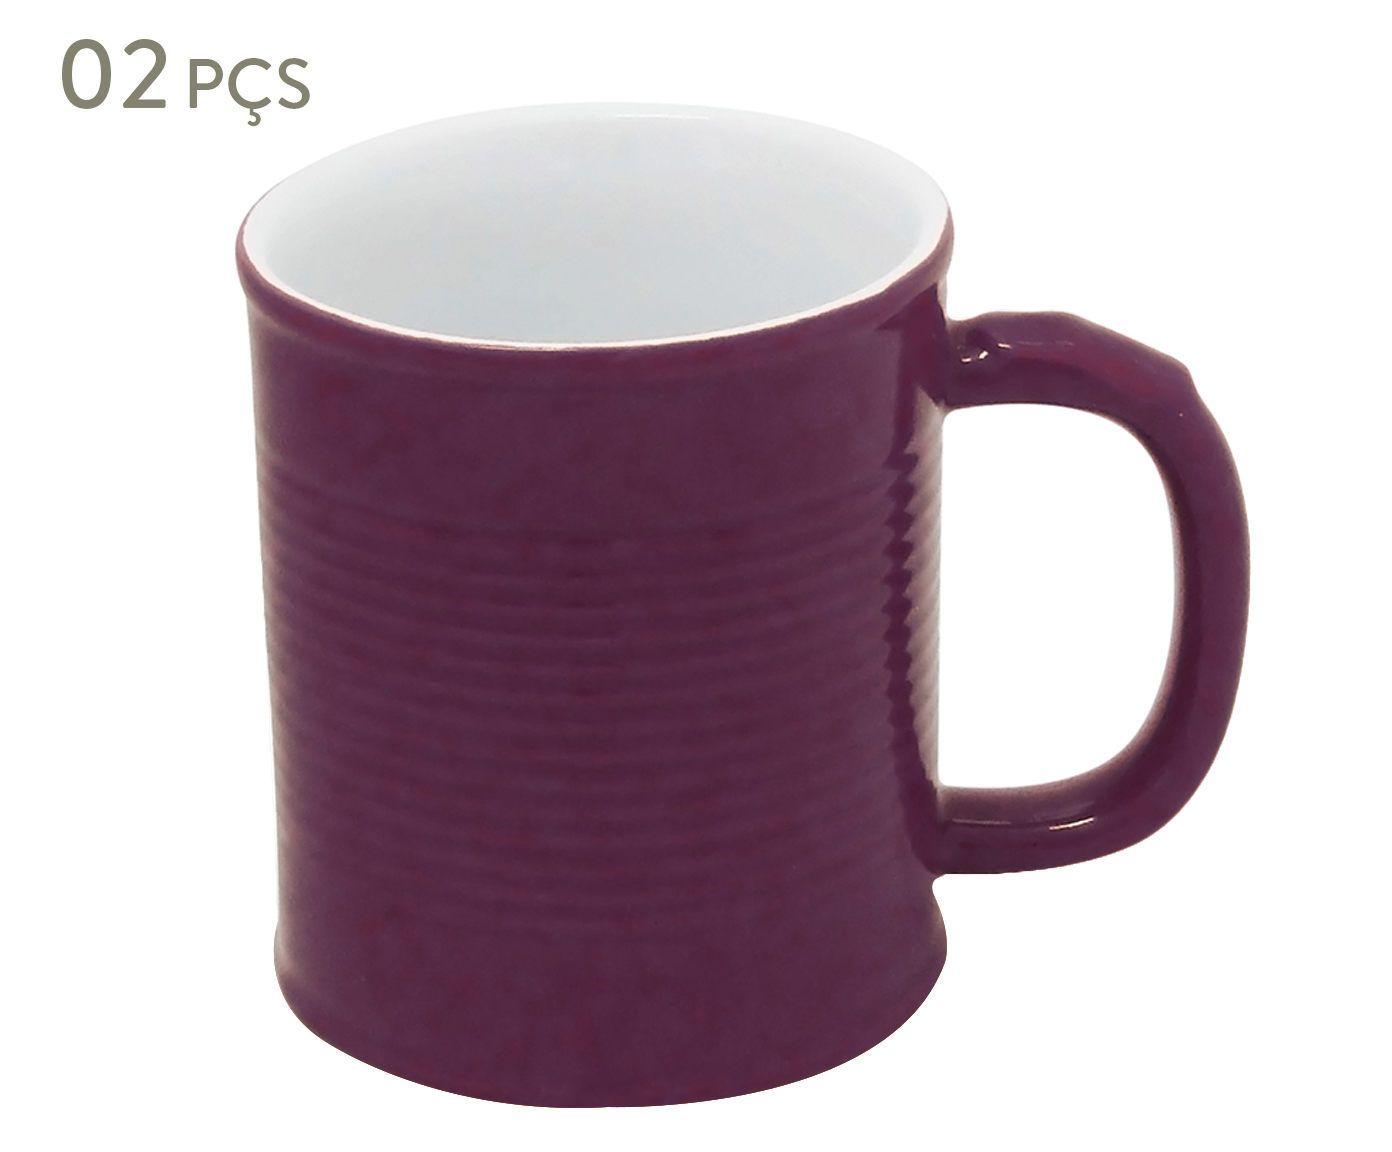 Conjunto de Canecas Espalier effect - 250 ml | Westwing.com.br